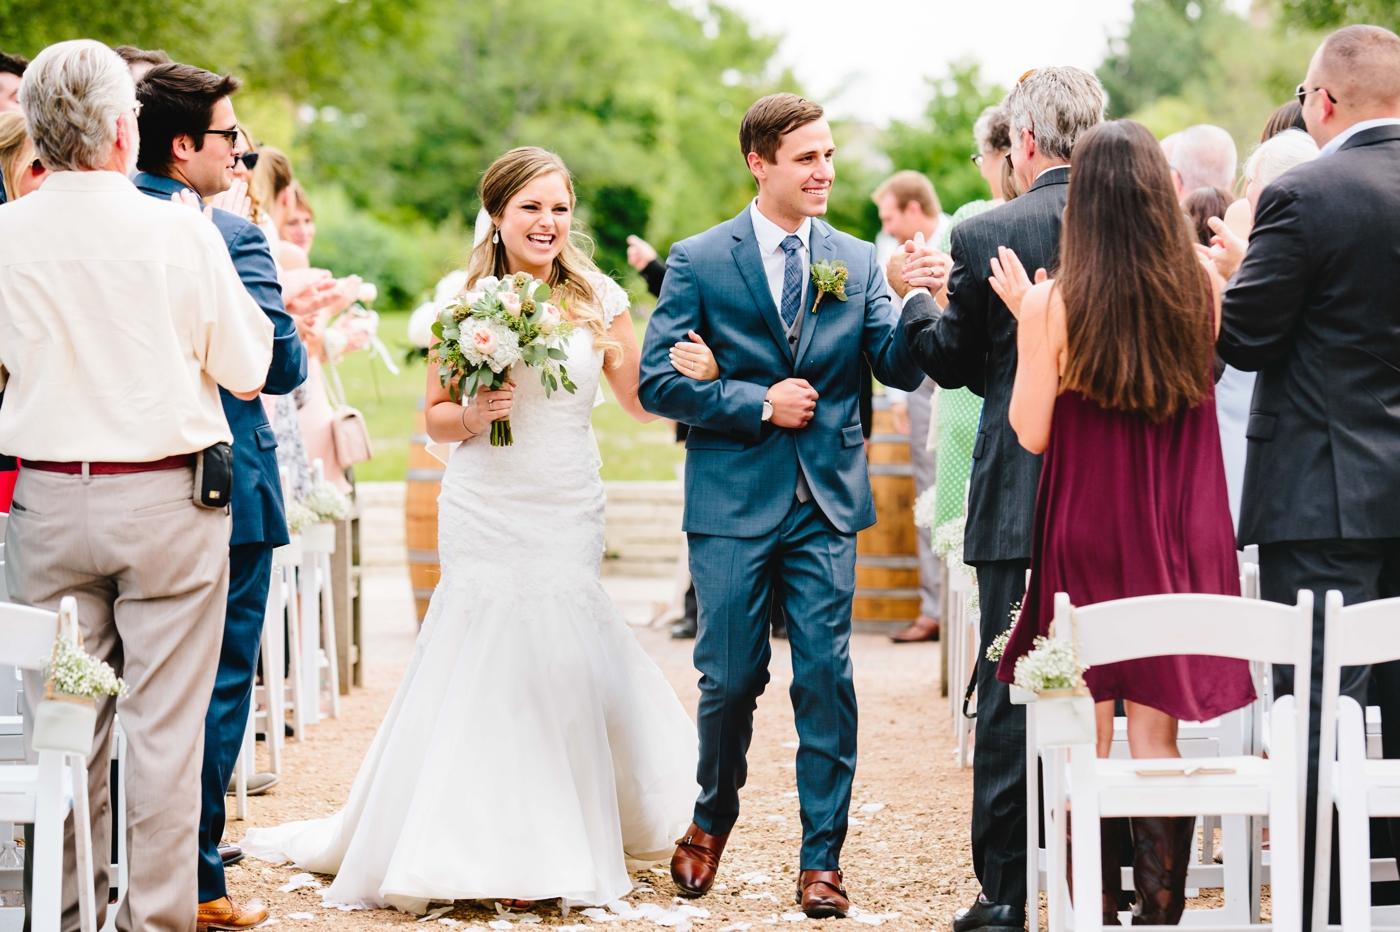 chicago-fine-art-wedding-photography-chiapetta31